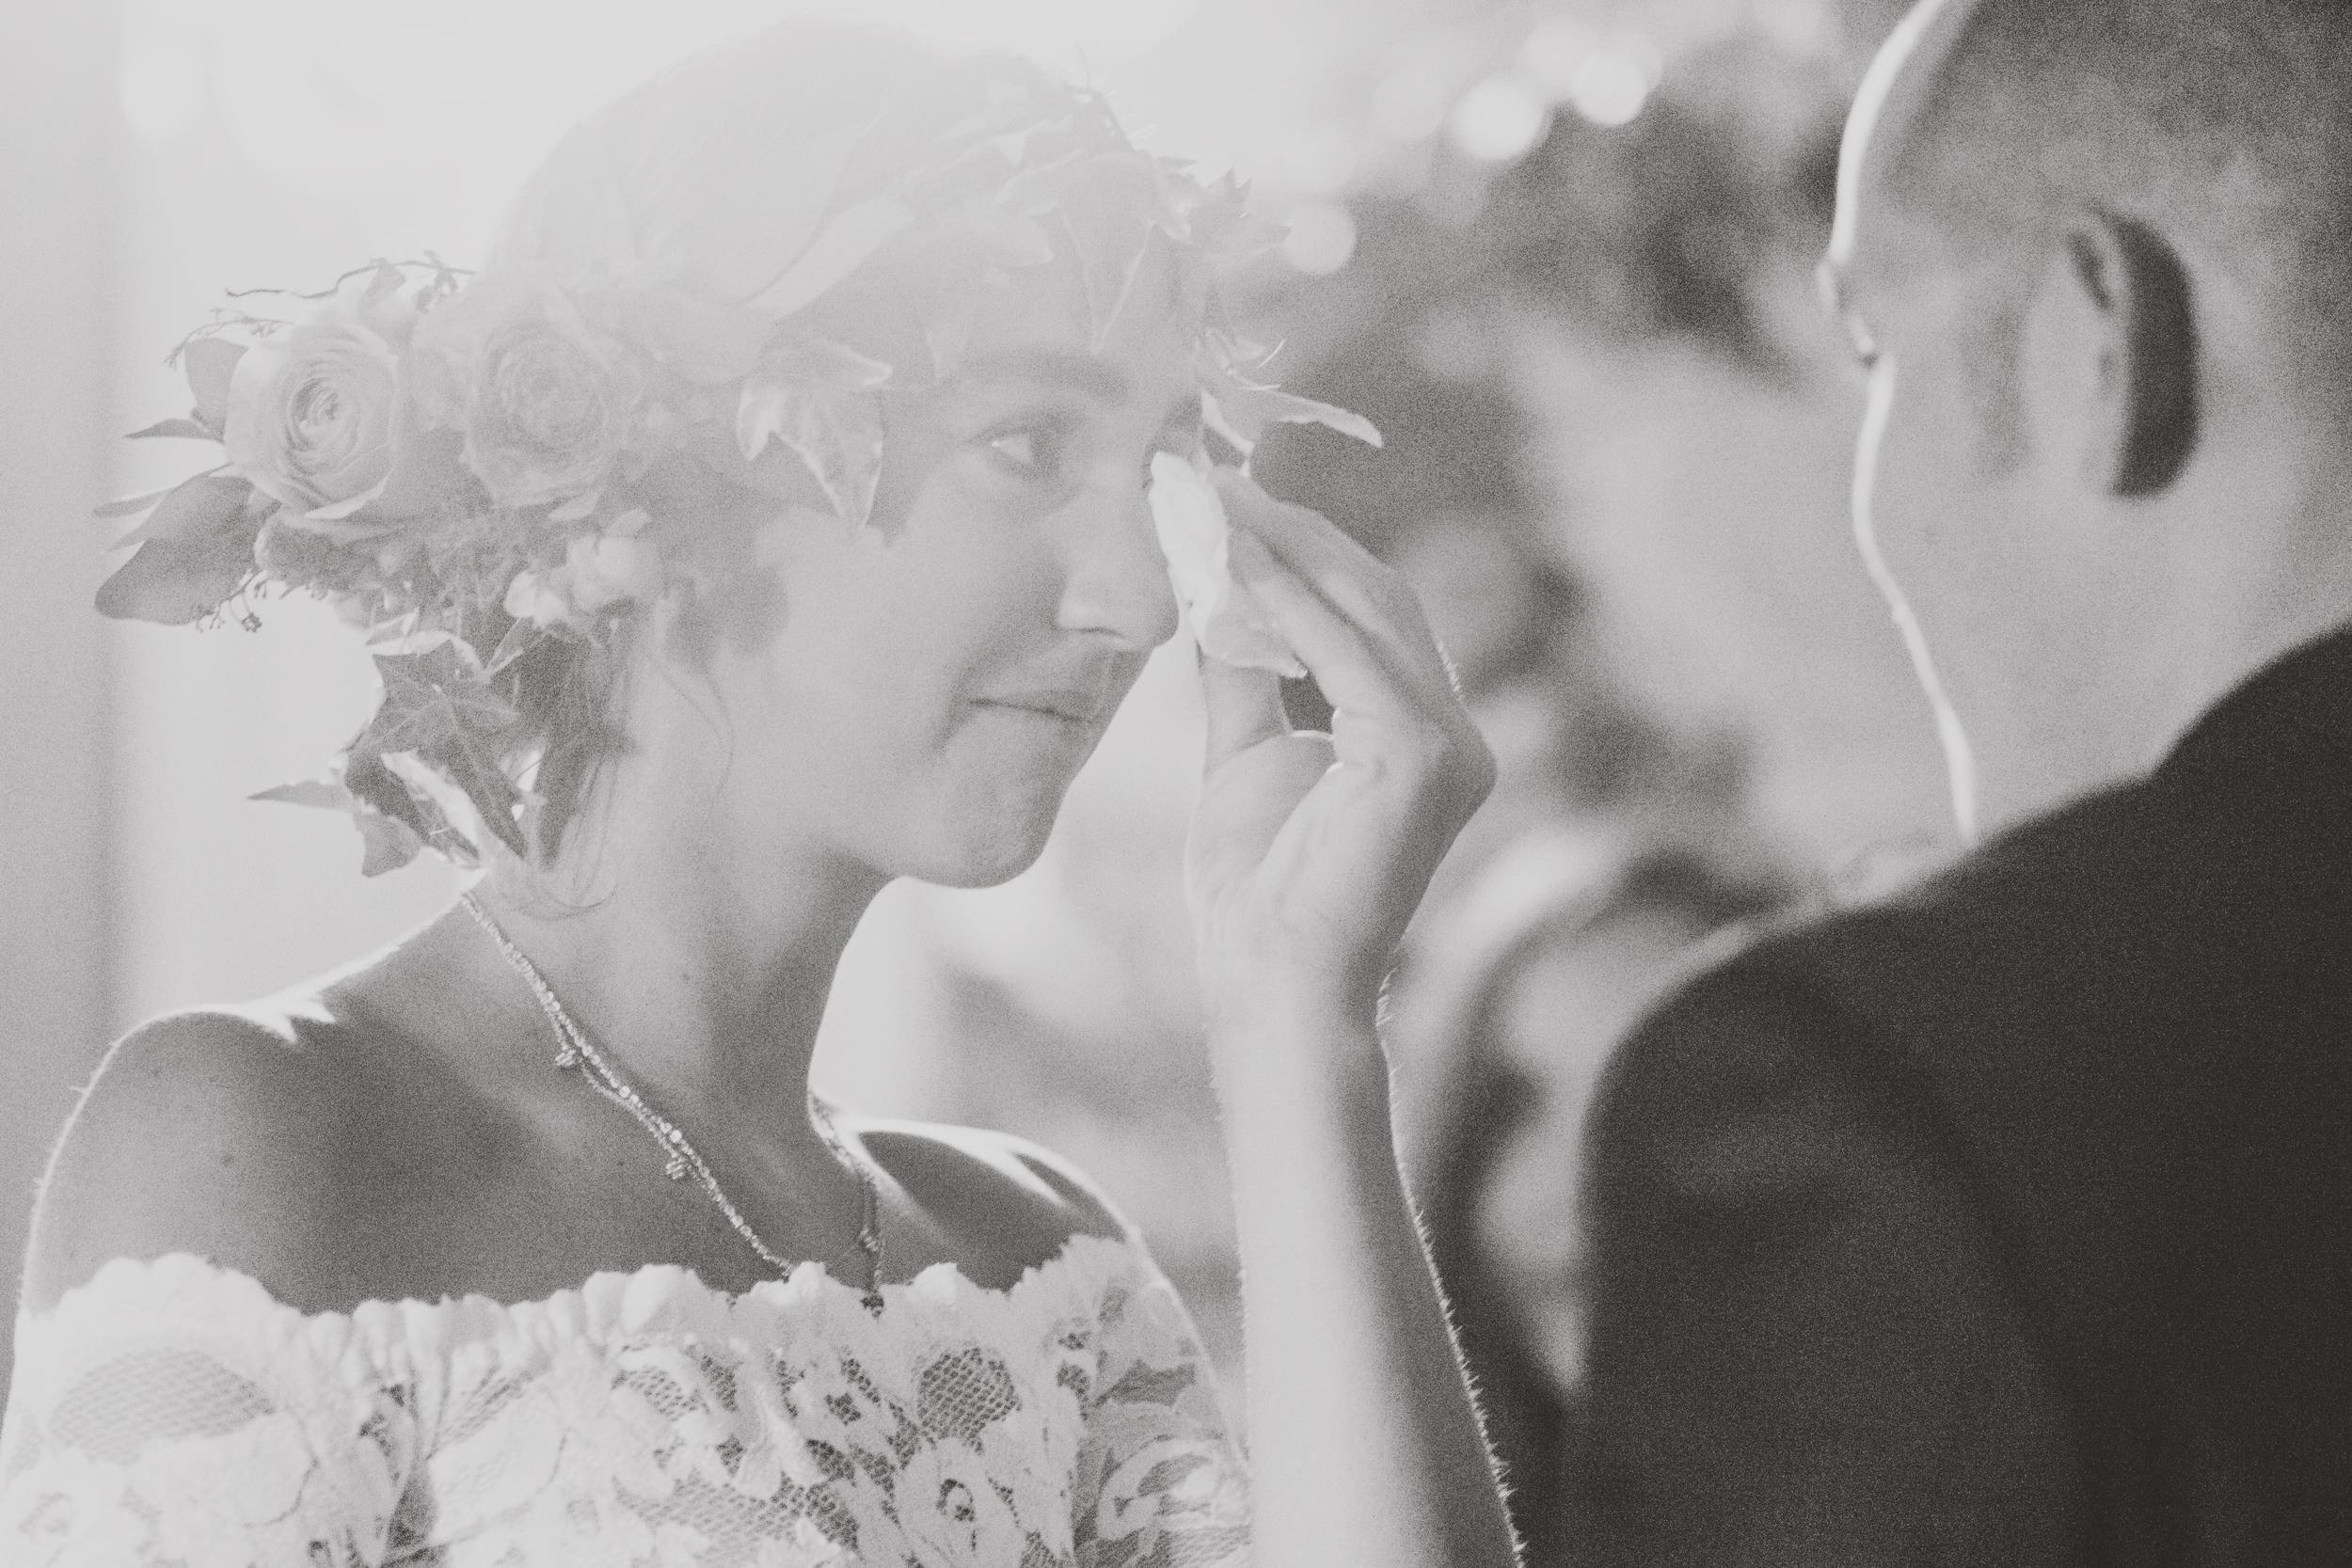 angie-diaz-photography-oahu-hawaii-wedding-tradewinds-ranch-61.jpg